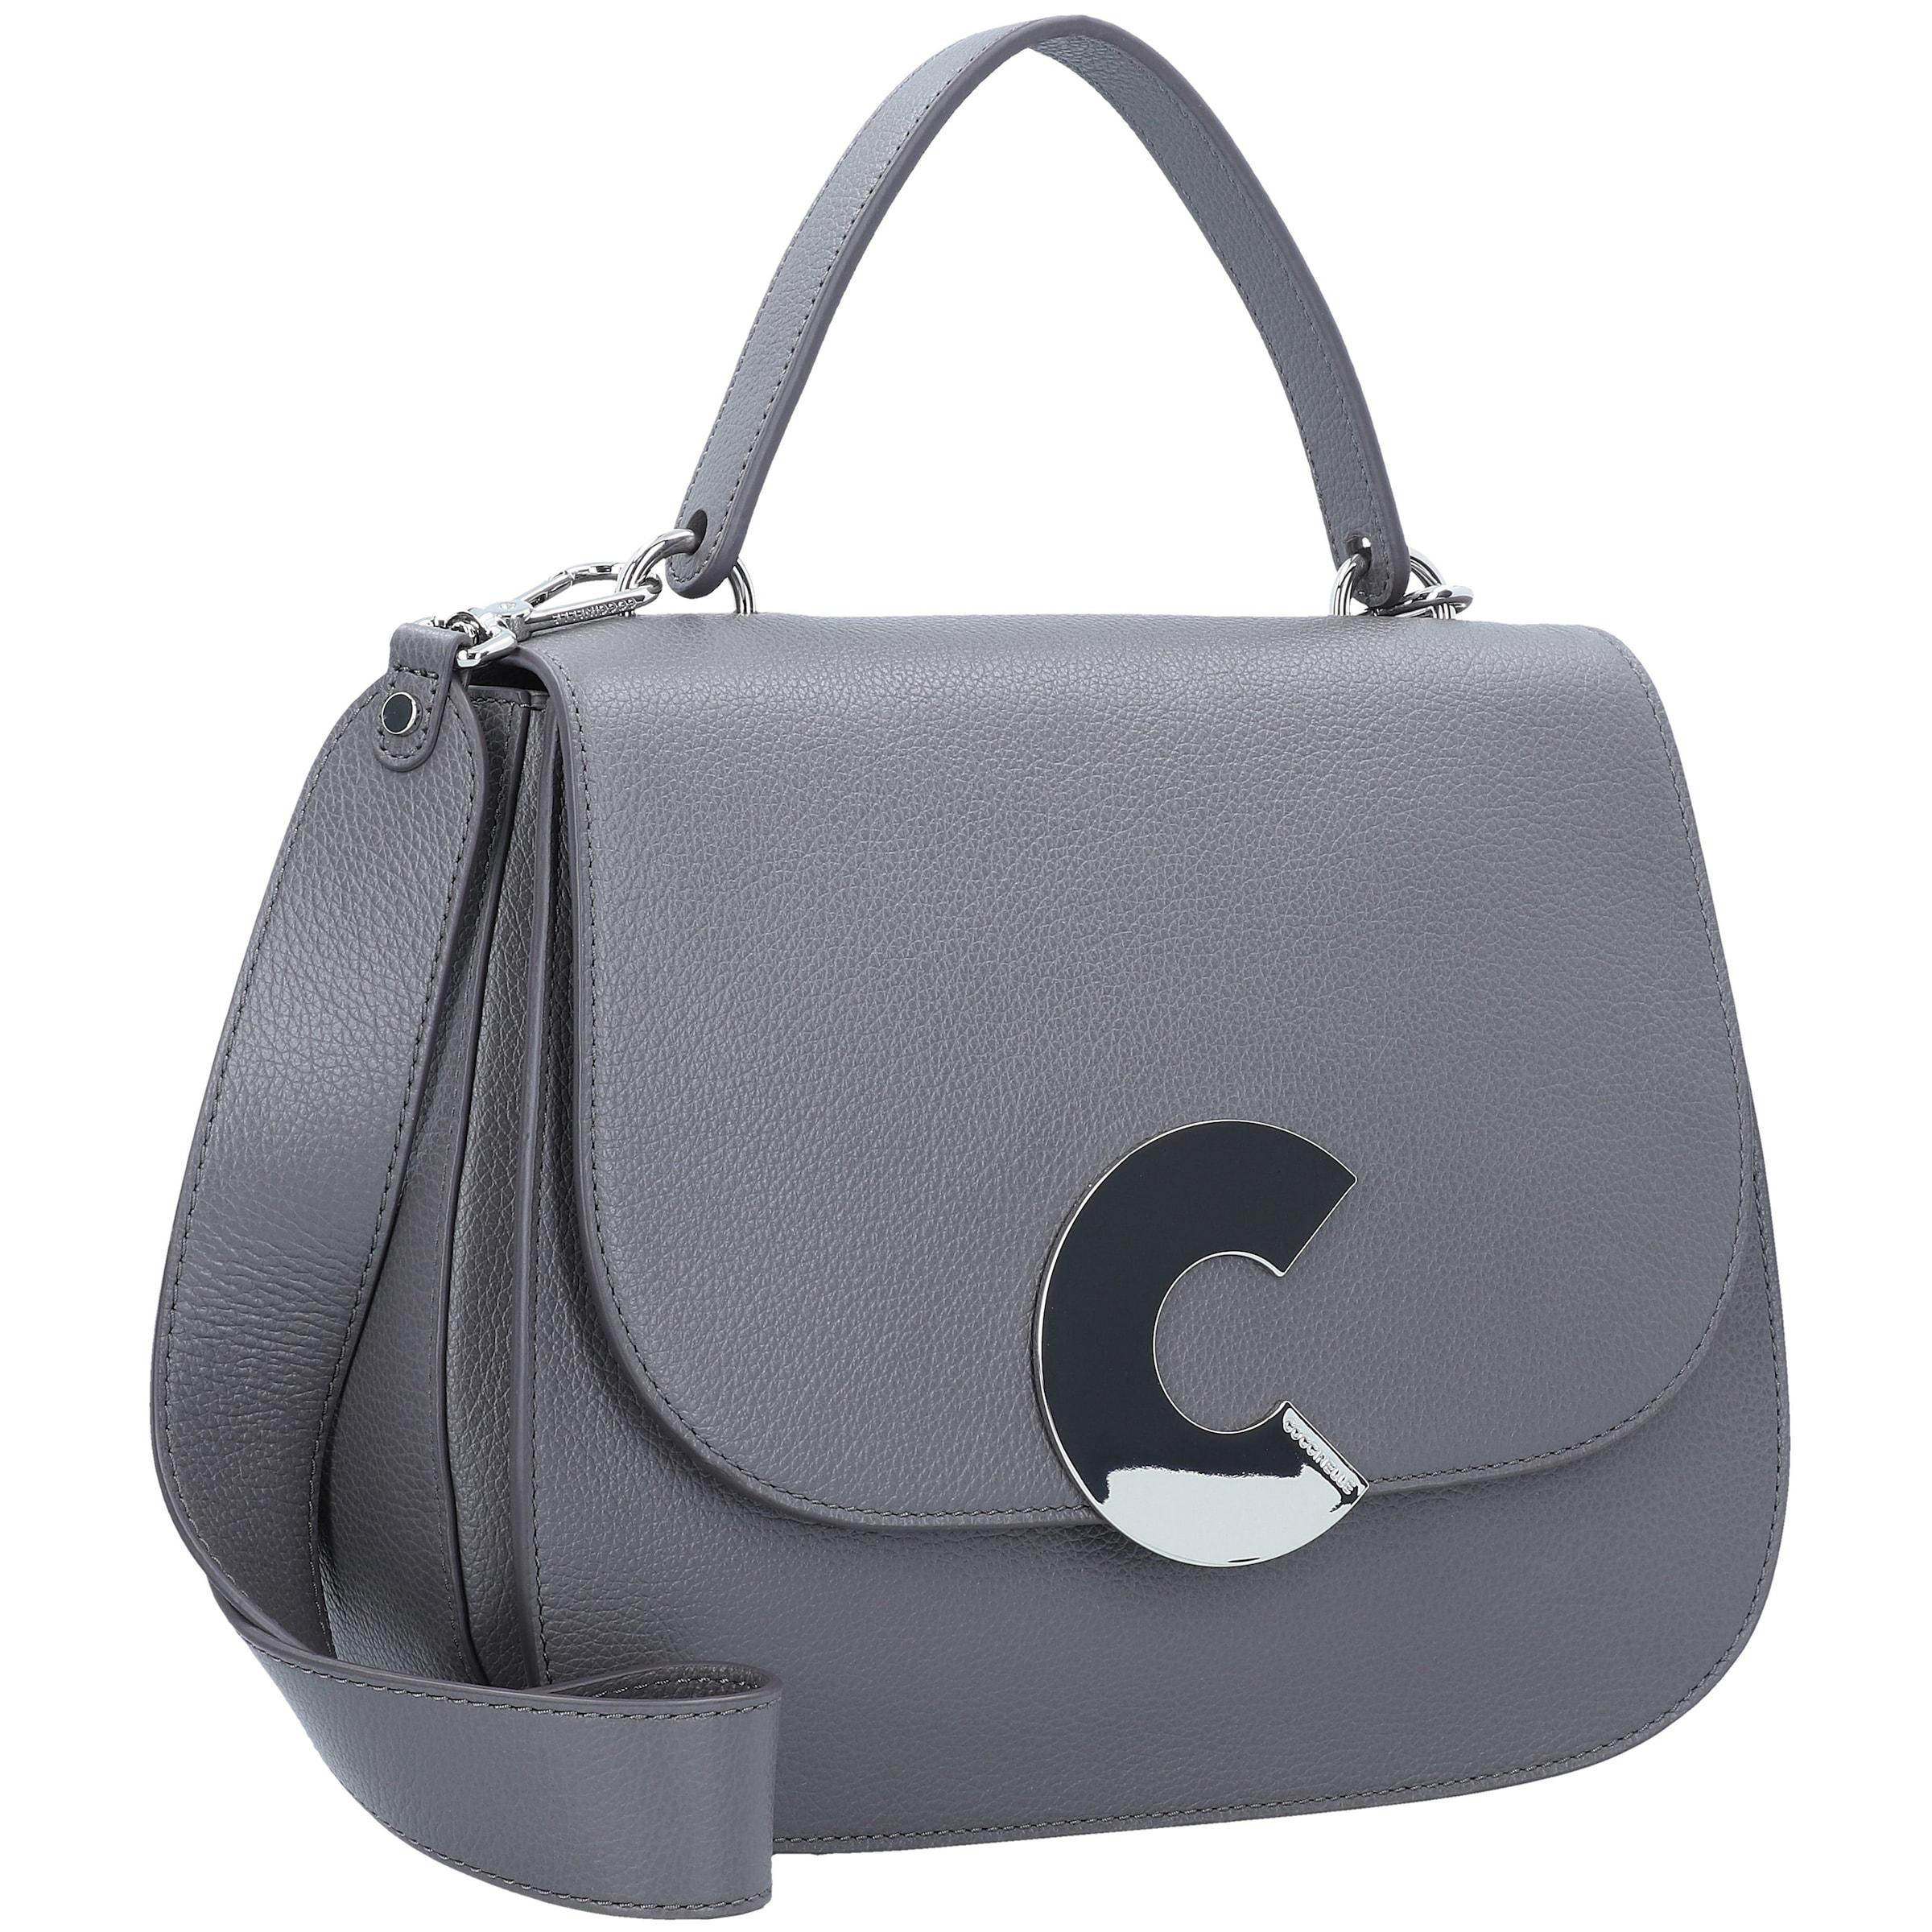 Coccinelle Grau In 'craquante' Grau Handtasche Handtasche 'craquante' Coccinelle In Coccinelle N80vwmn